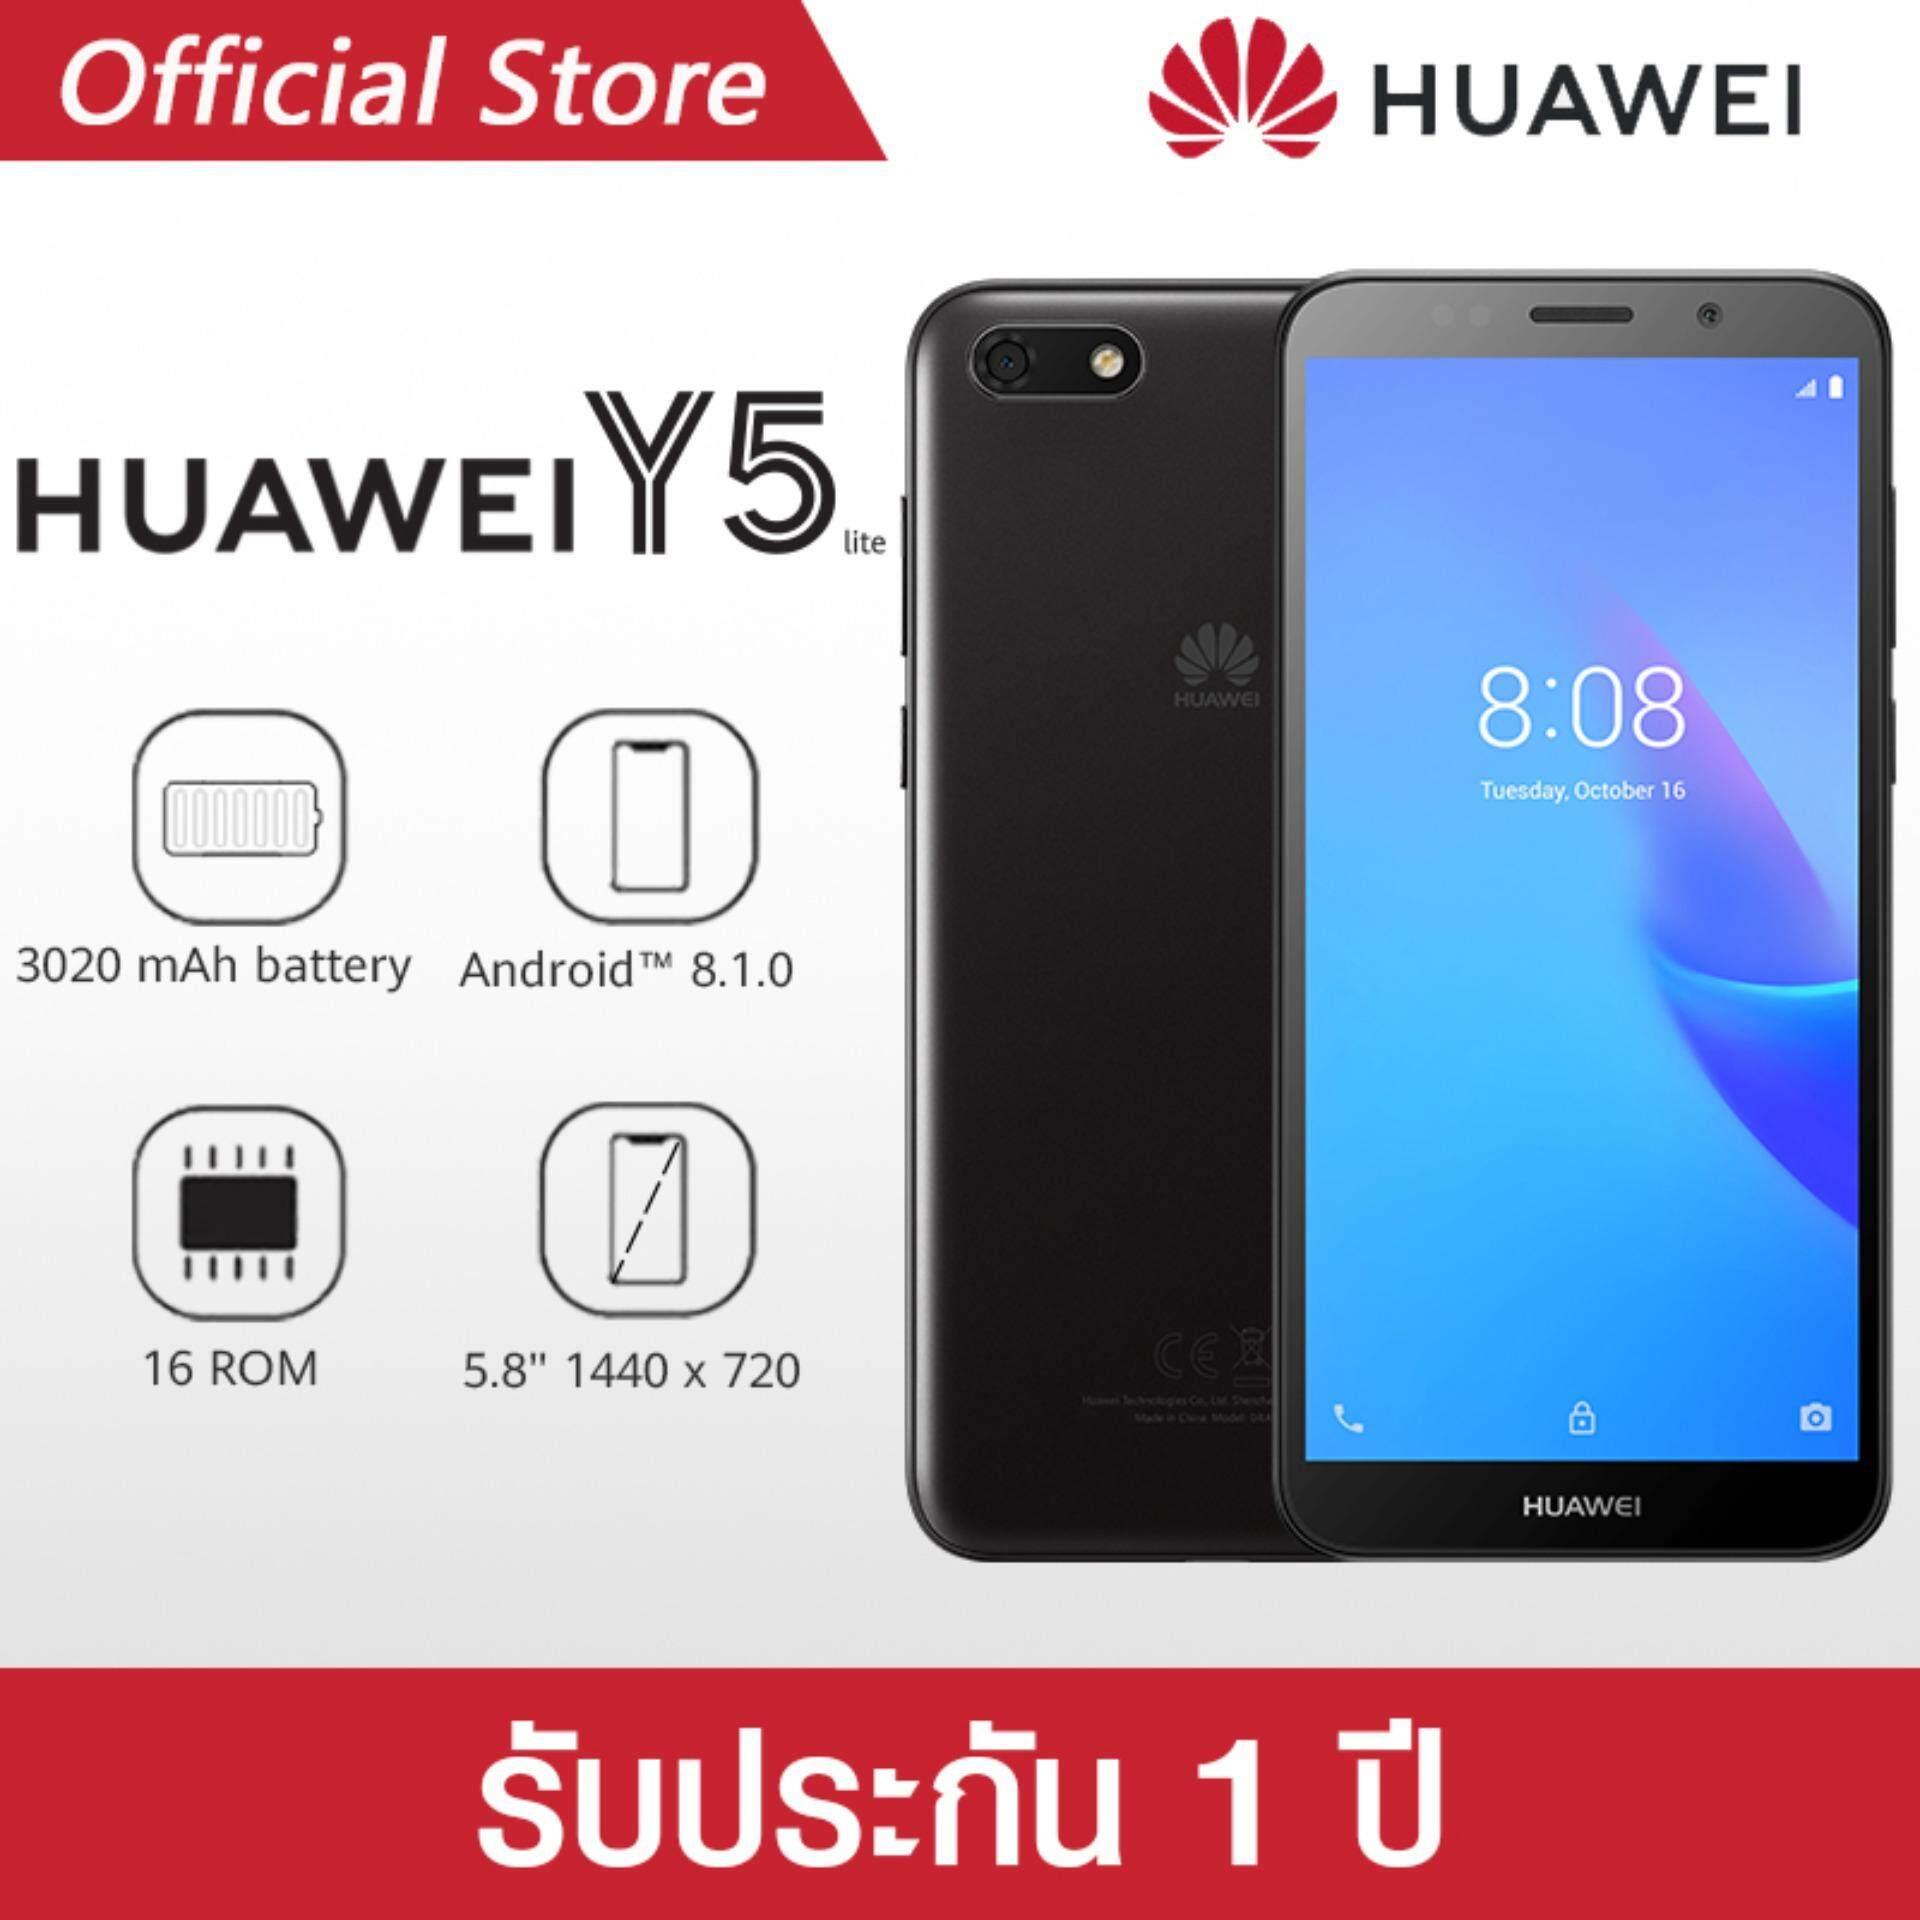 [Huawei official store]Huawei Y5 Lite  หน้าจอกว้างไร้ขอบขนาด  5.45 นิ้ว